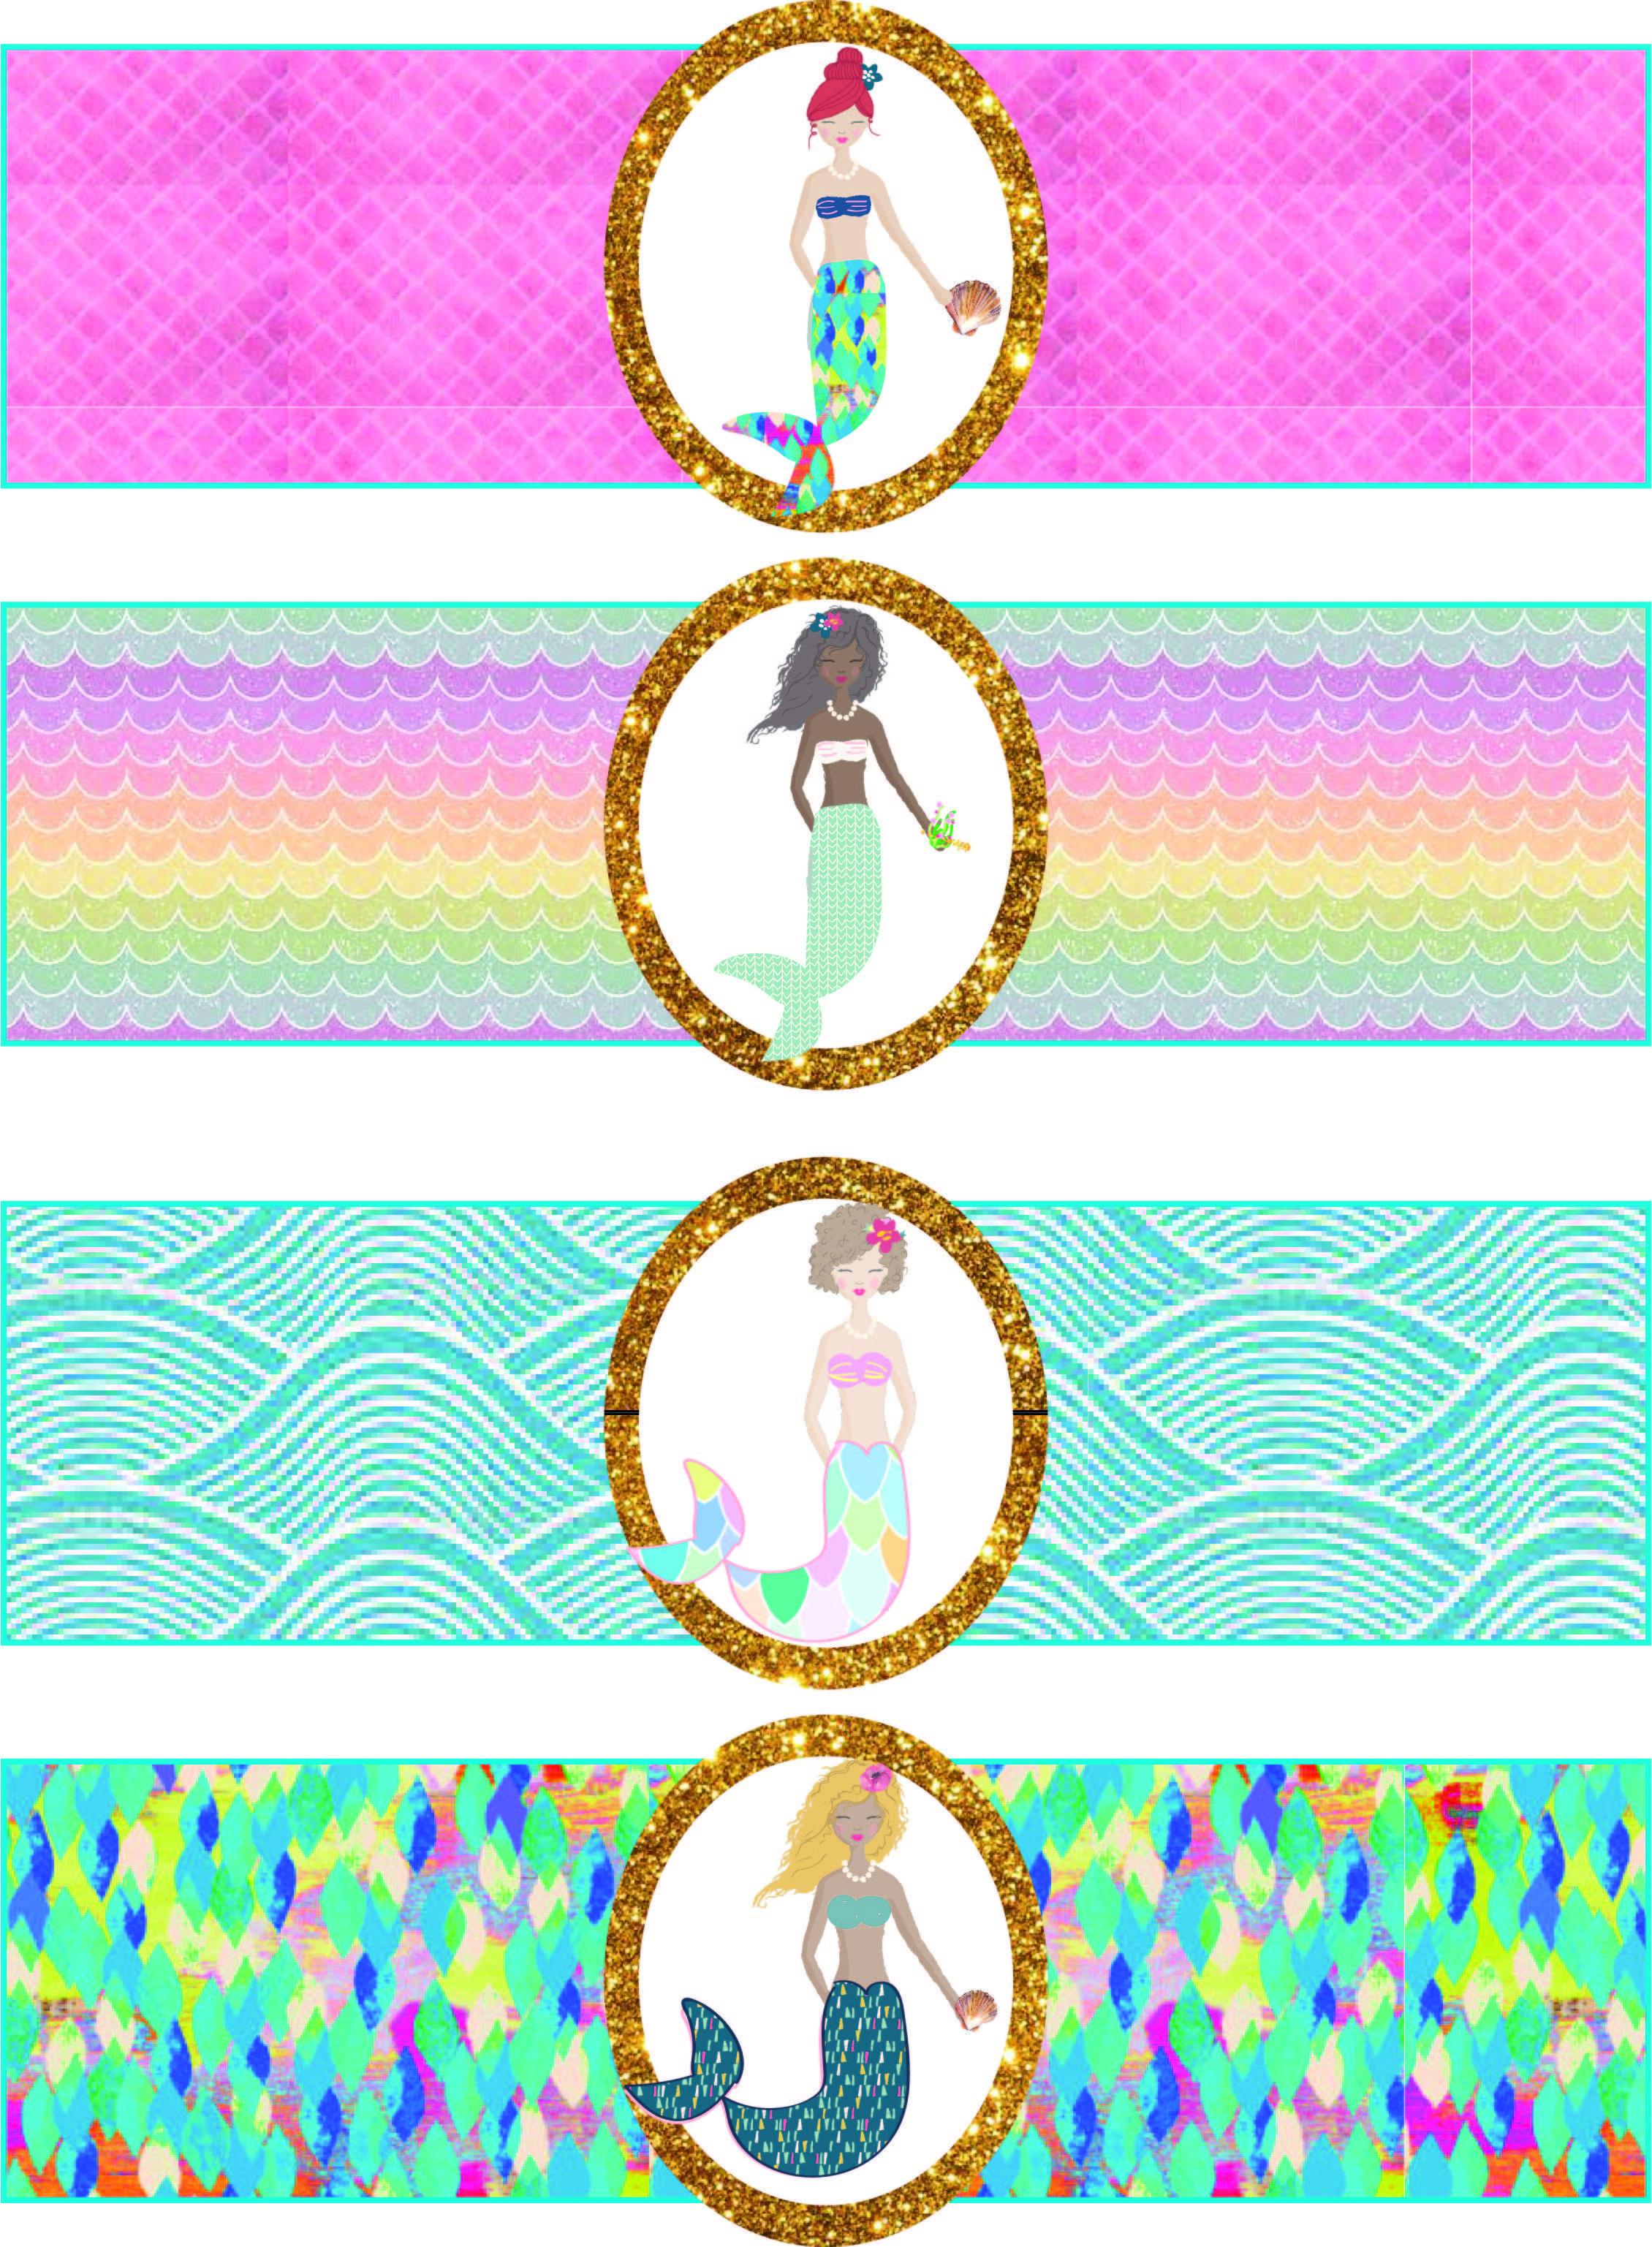 Free Mermaid Birthday Party Printables | Free Girls Party Printables - Mermaid Party Invitations Printable Free